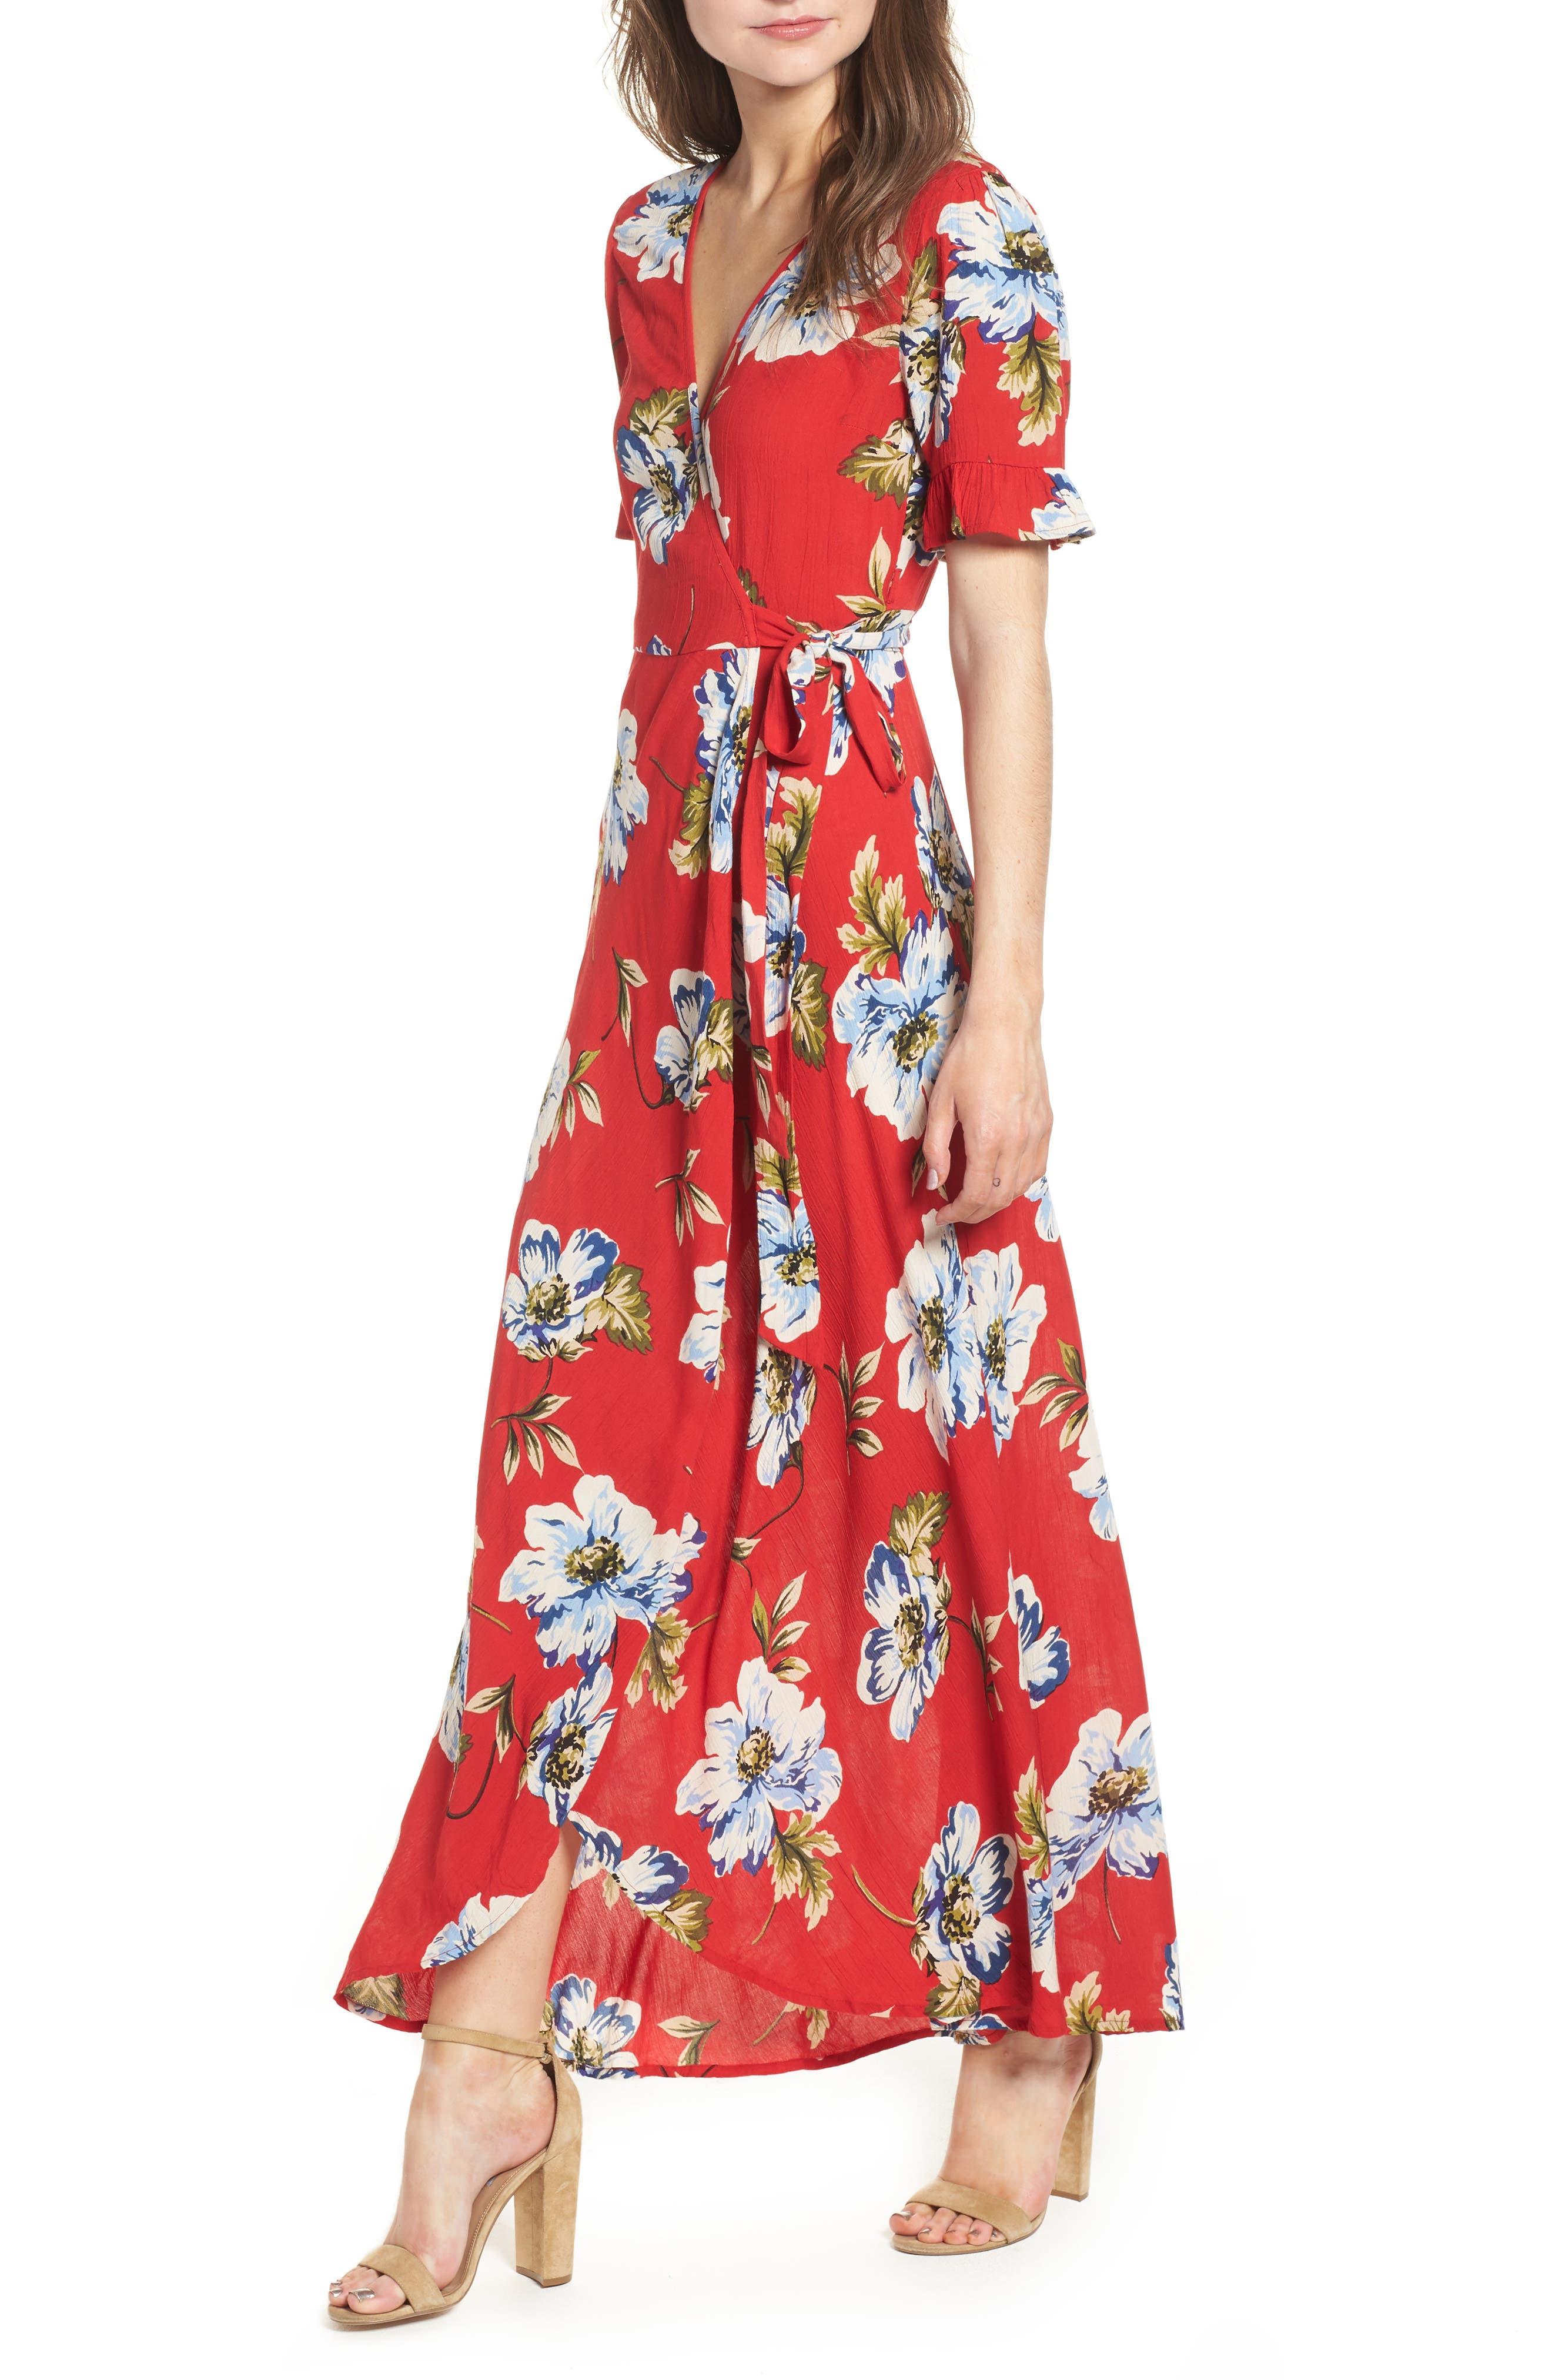 Blue Moon Floral Print Wrap Dress,                         Main,                         color, Red/ Sky